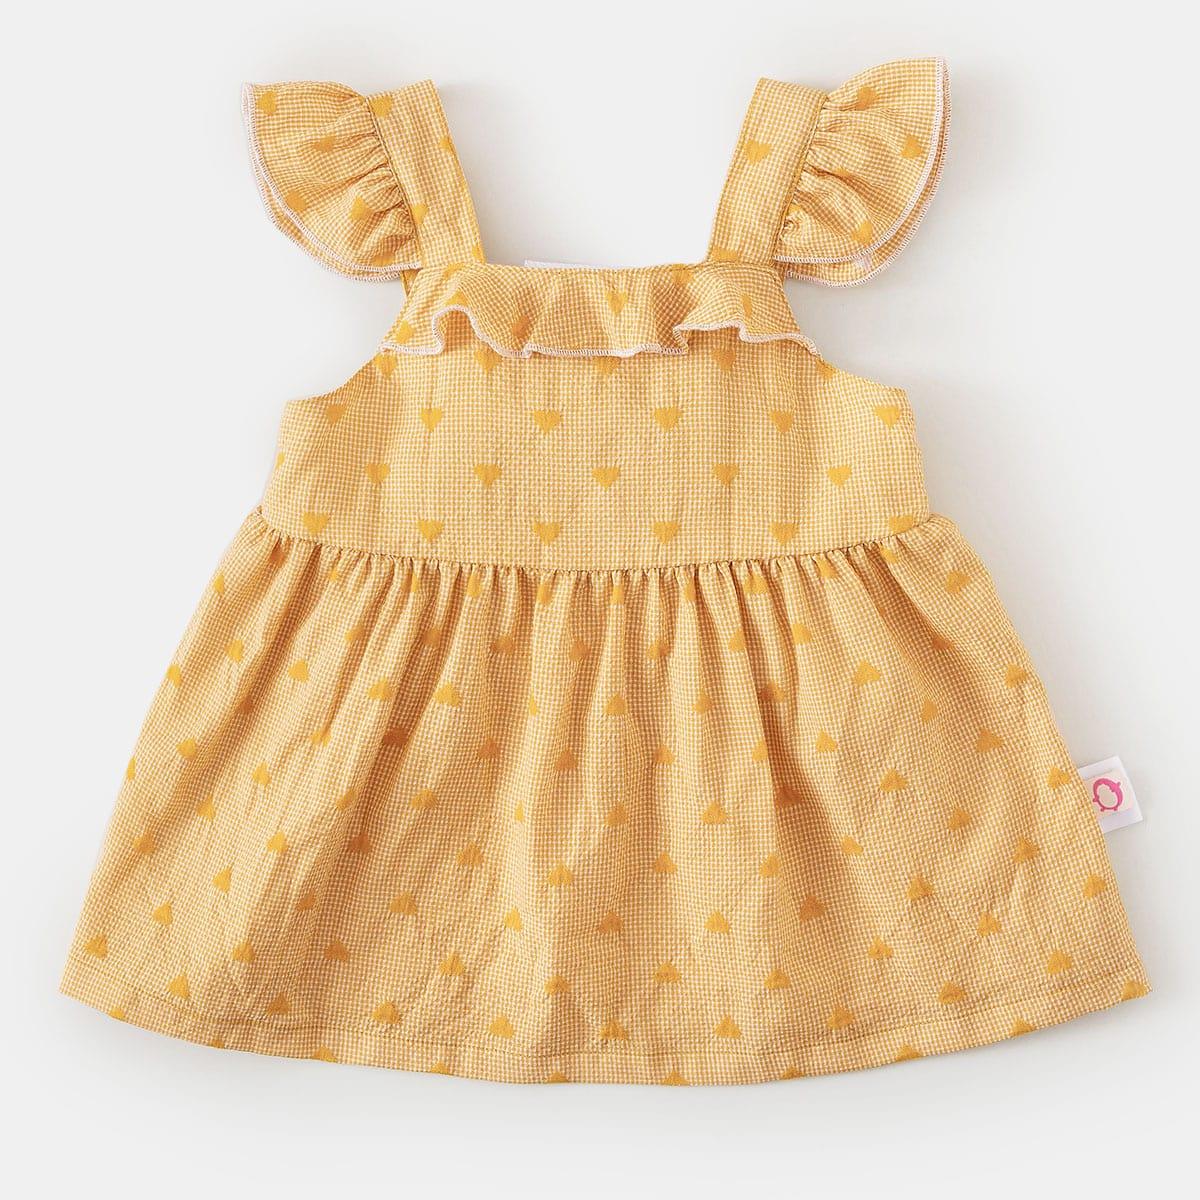 shein Schattig Hart Baby-jurk Rimpeling